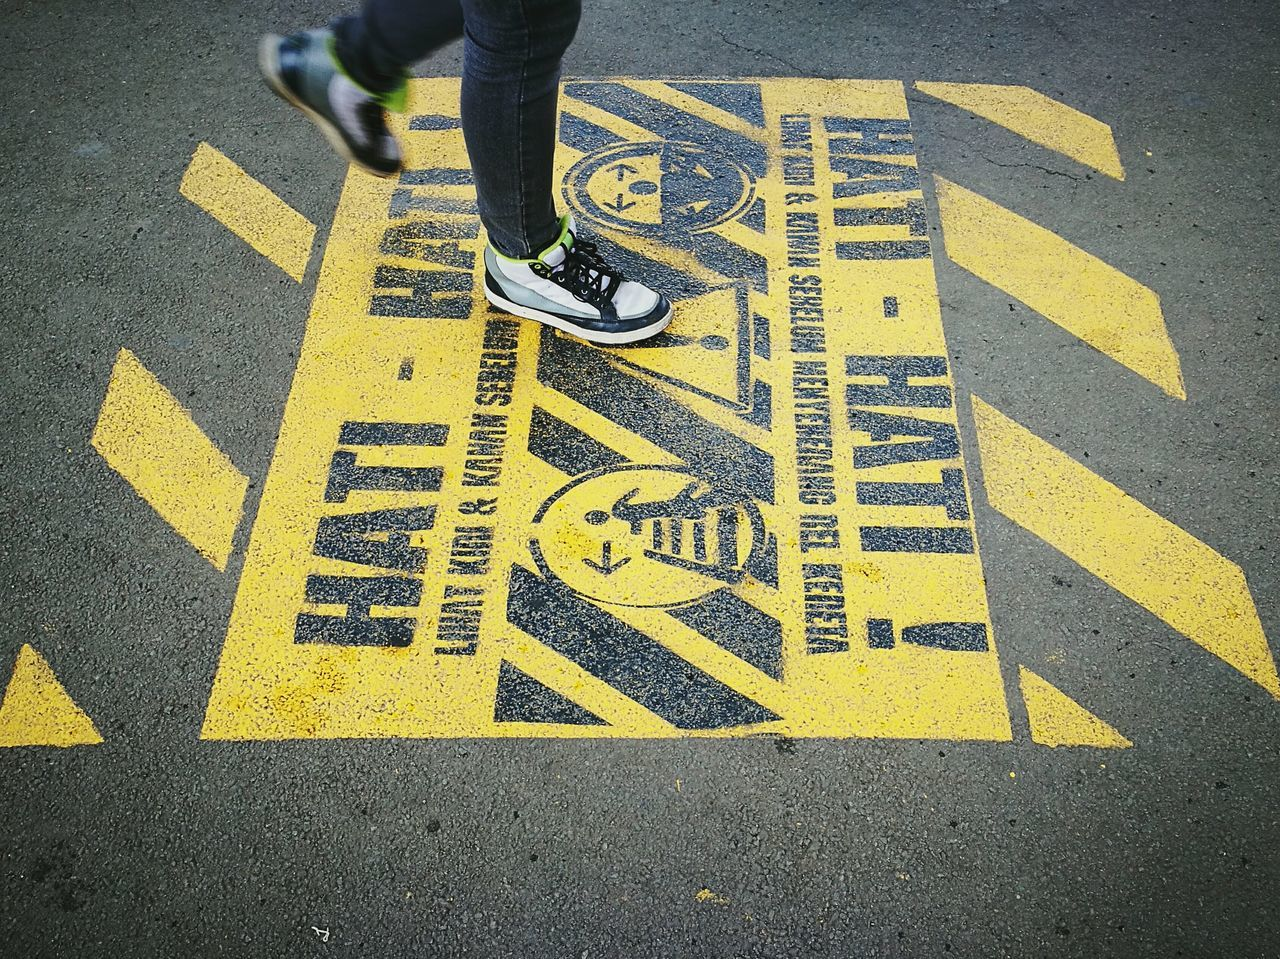 Walking on Signage at Railwaystation Streetphotography Passenger Jakarta Commuterline Enjoying Life Sneakers Outdoors